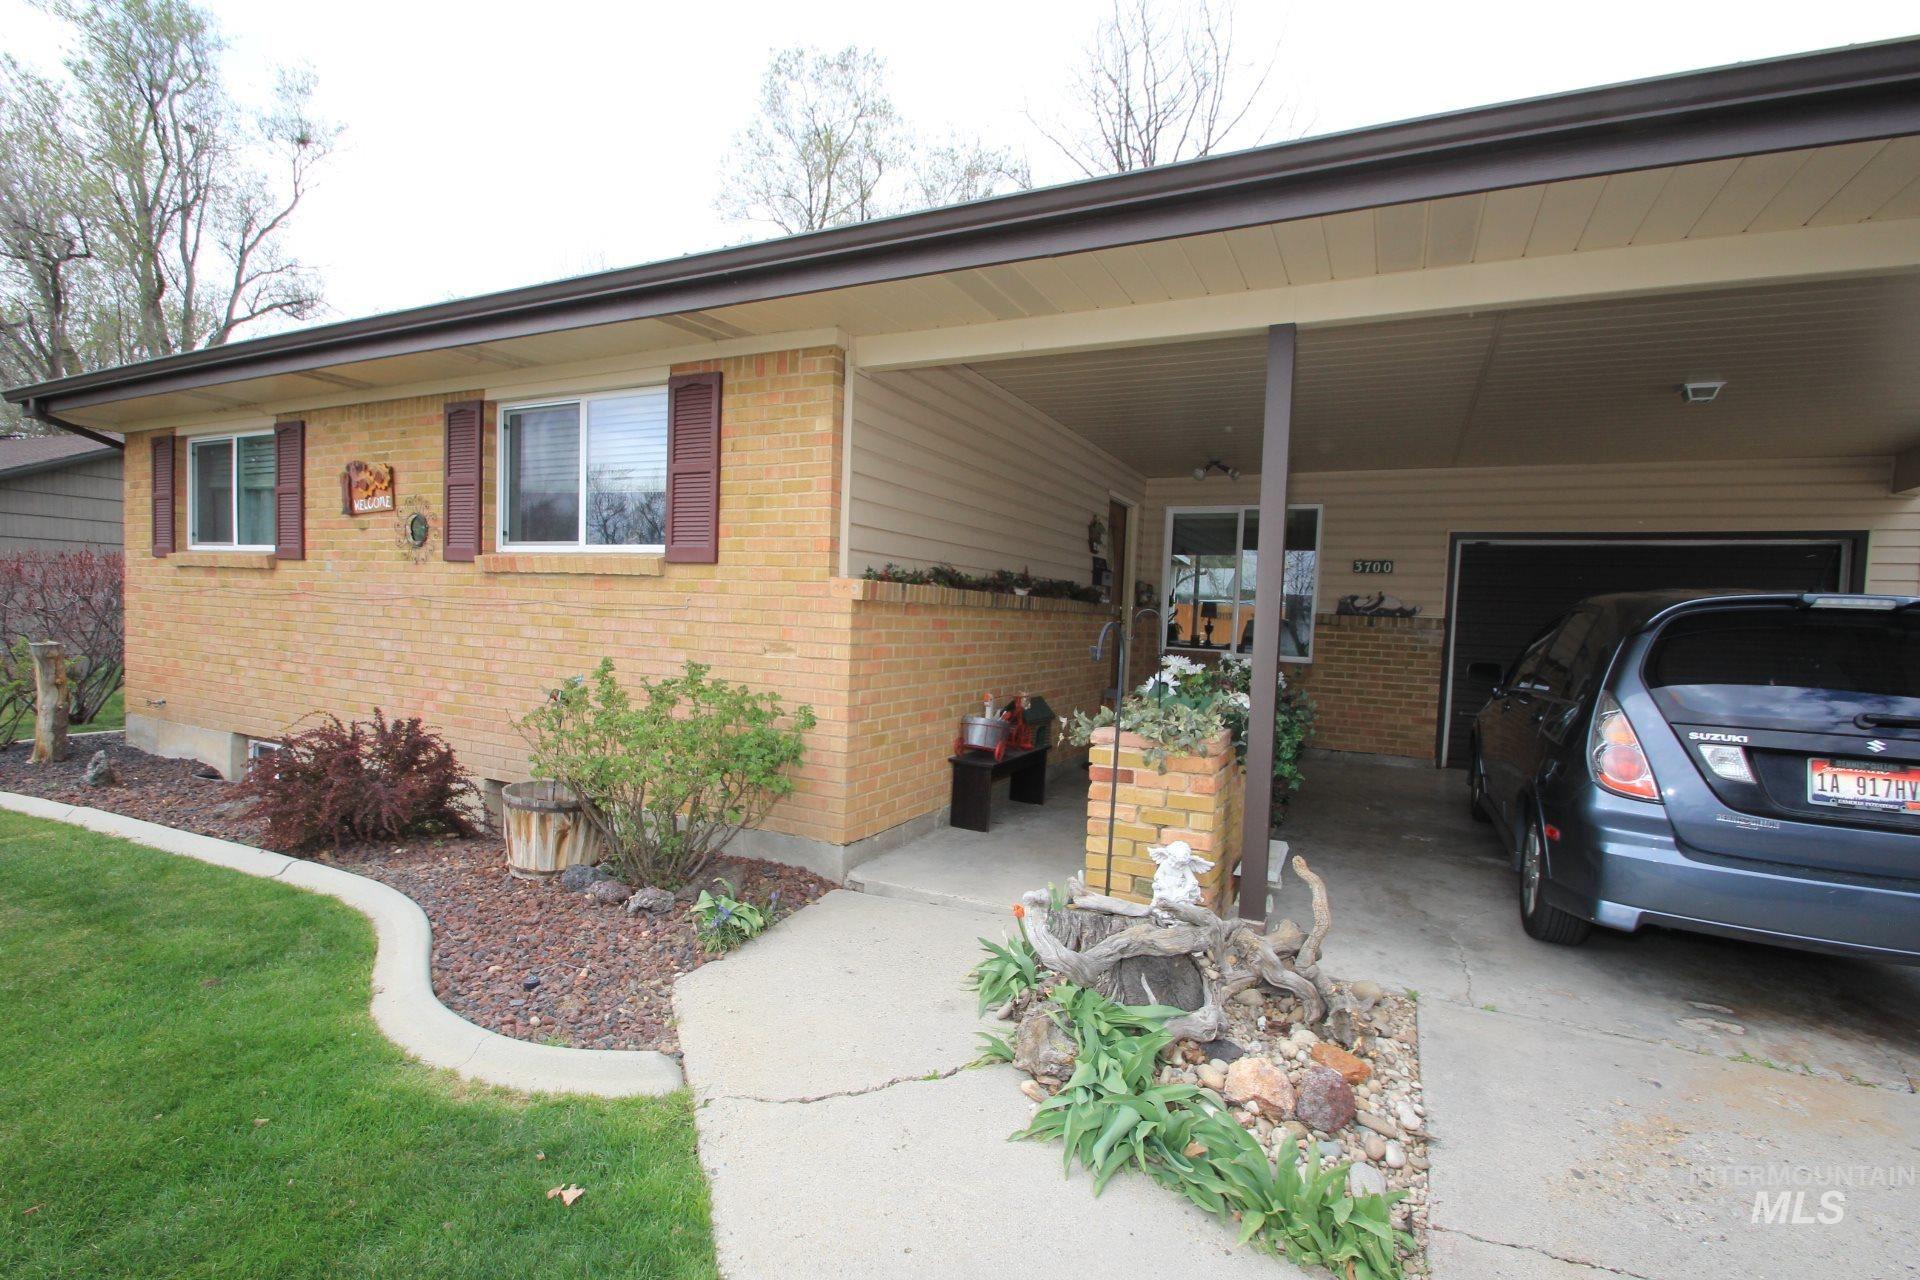 Photo of 3700 Normandie Dr., Boise, ID 83705 (MLS # 98799077)